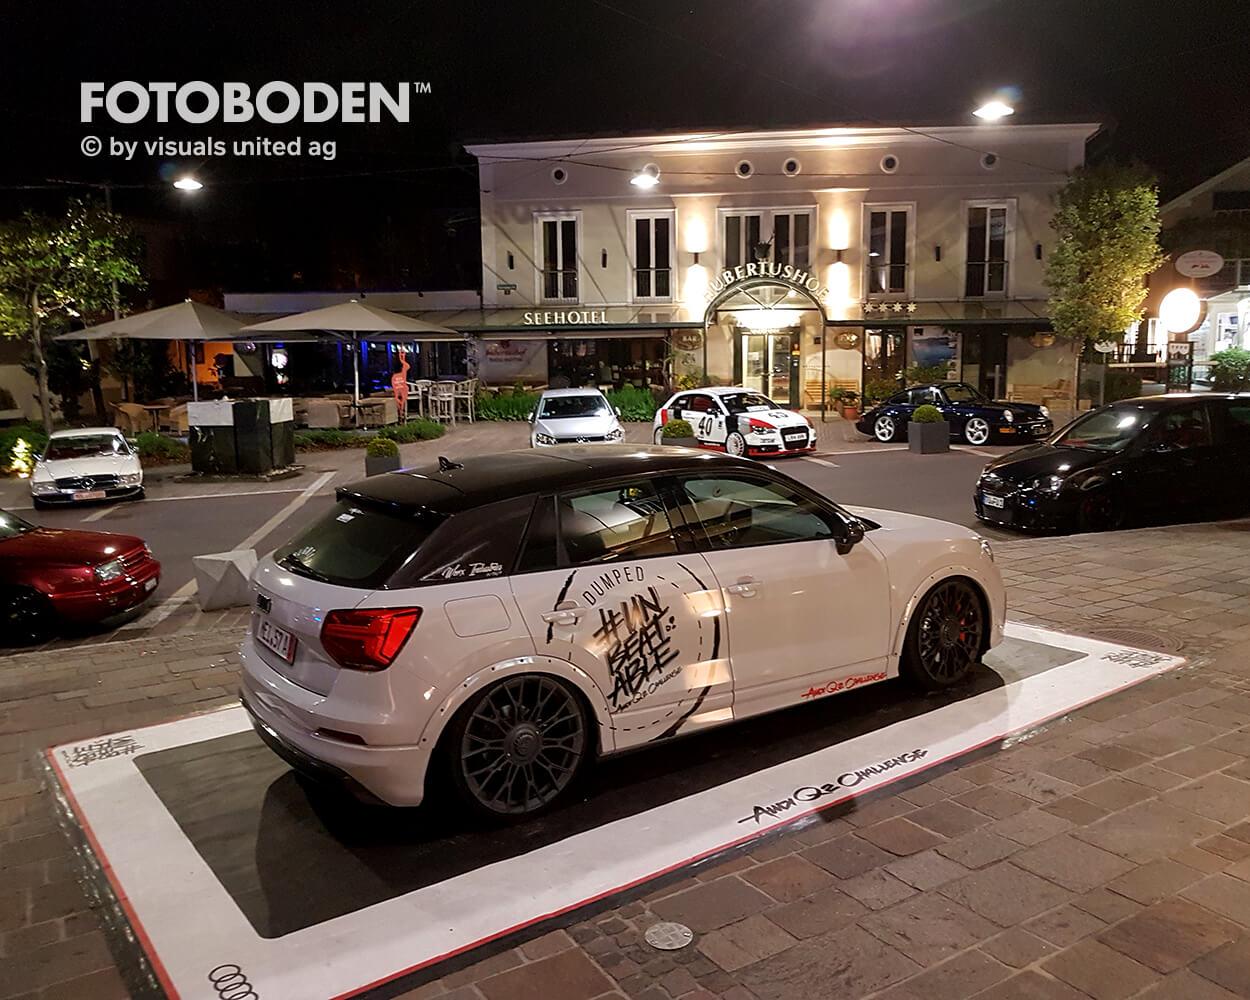 Audi Fotoboden Flooring Fußboden Bodengestaltung Floorminder Bodendruck Werbung Fußbodenwerbung Bodenwerbung Merchandising Advertising Visualmerchandising2